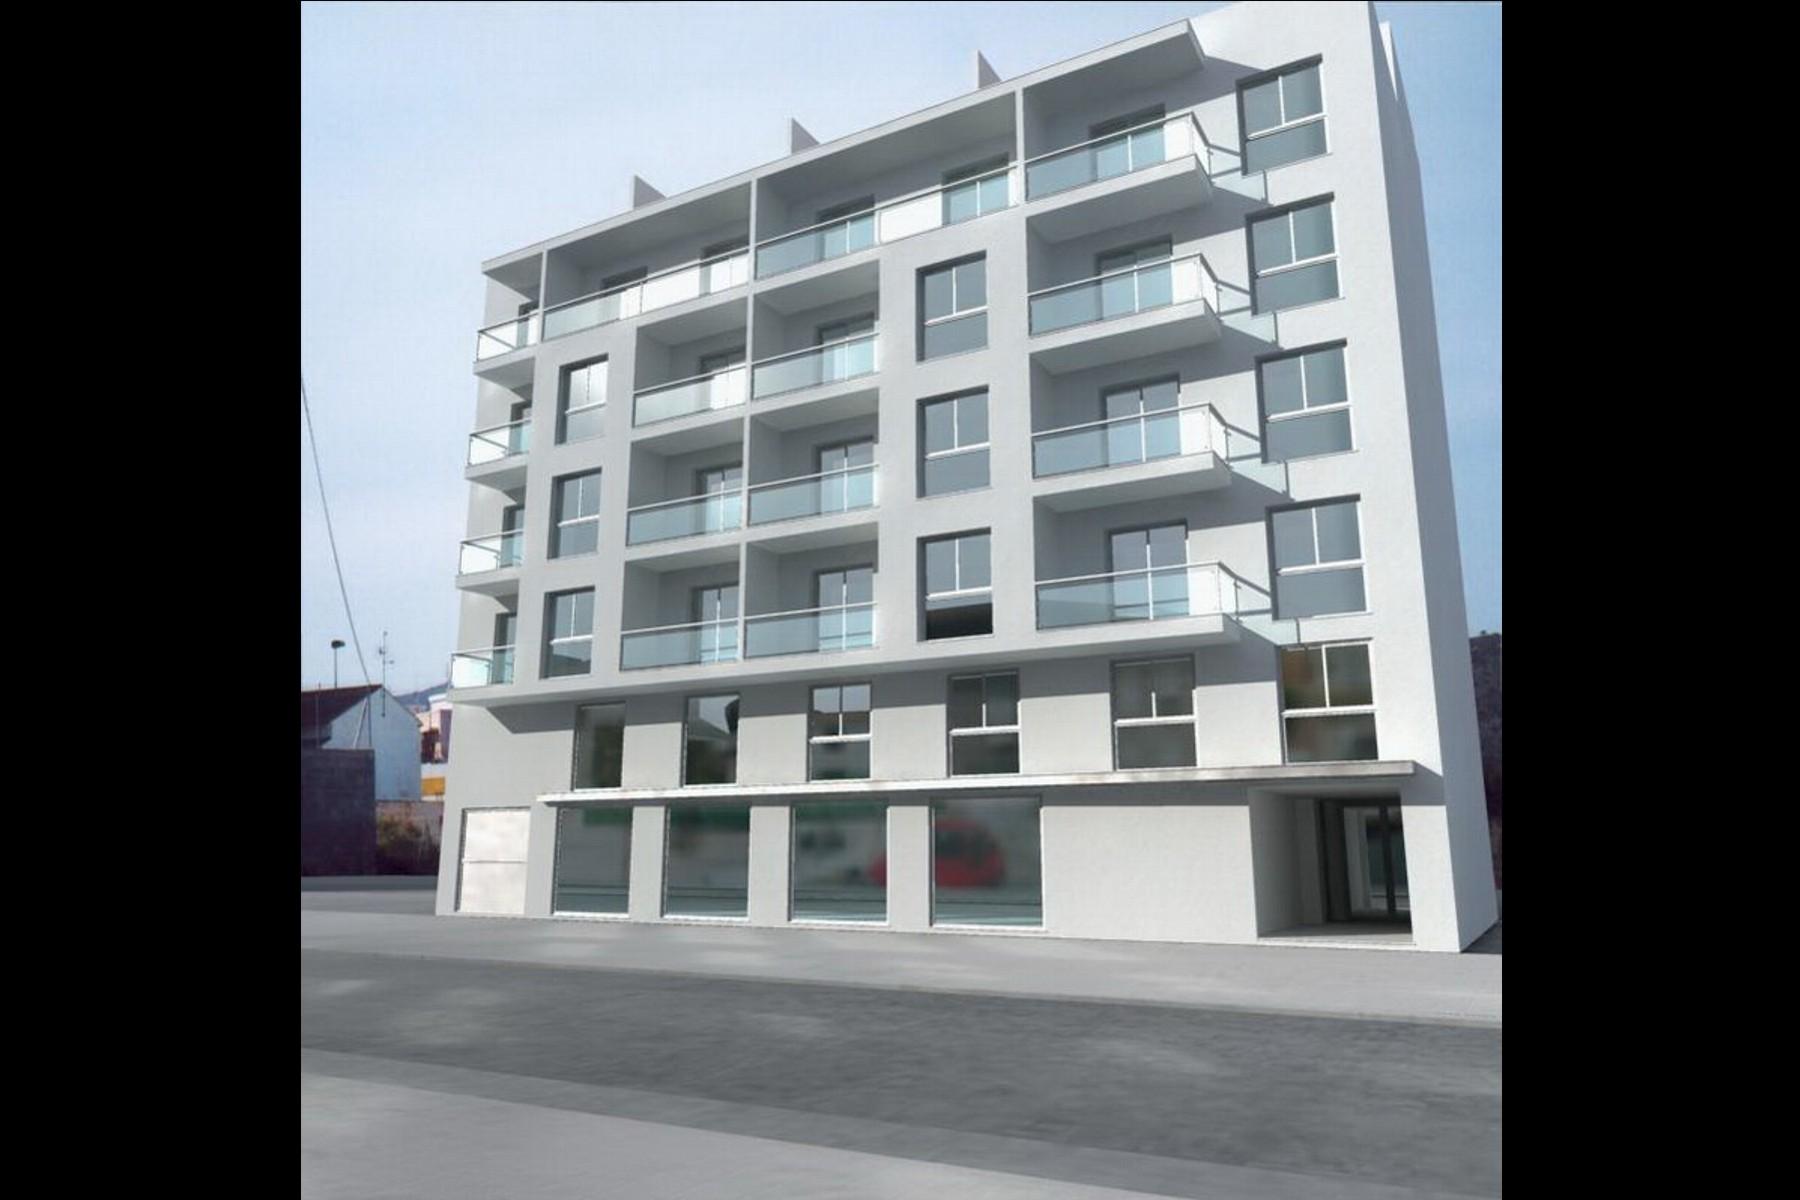 Imaginarq-042-edificio-viviendas.-Pego.-Alicante.09A